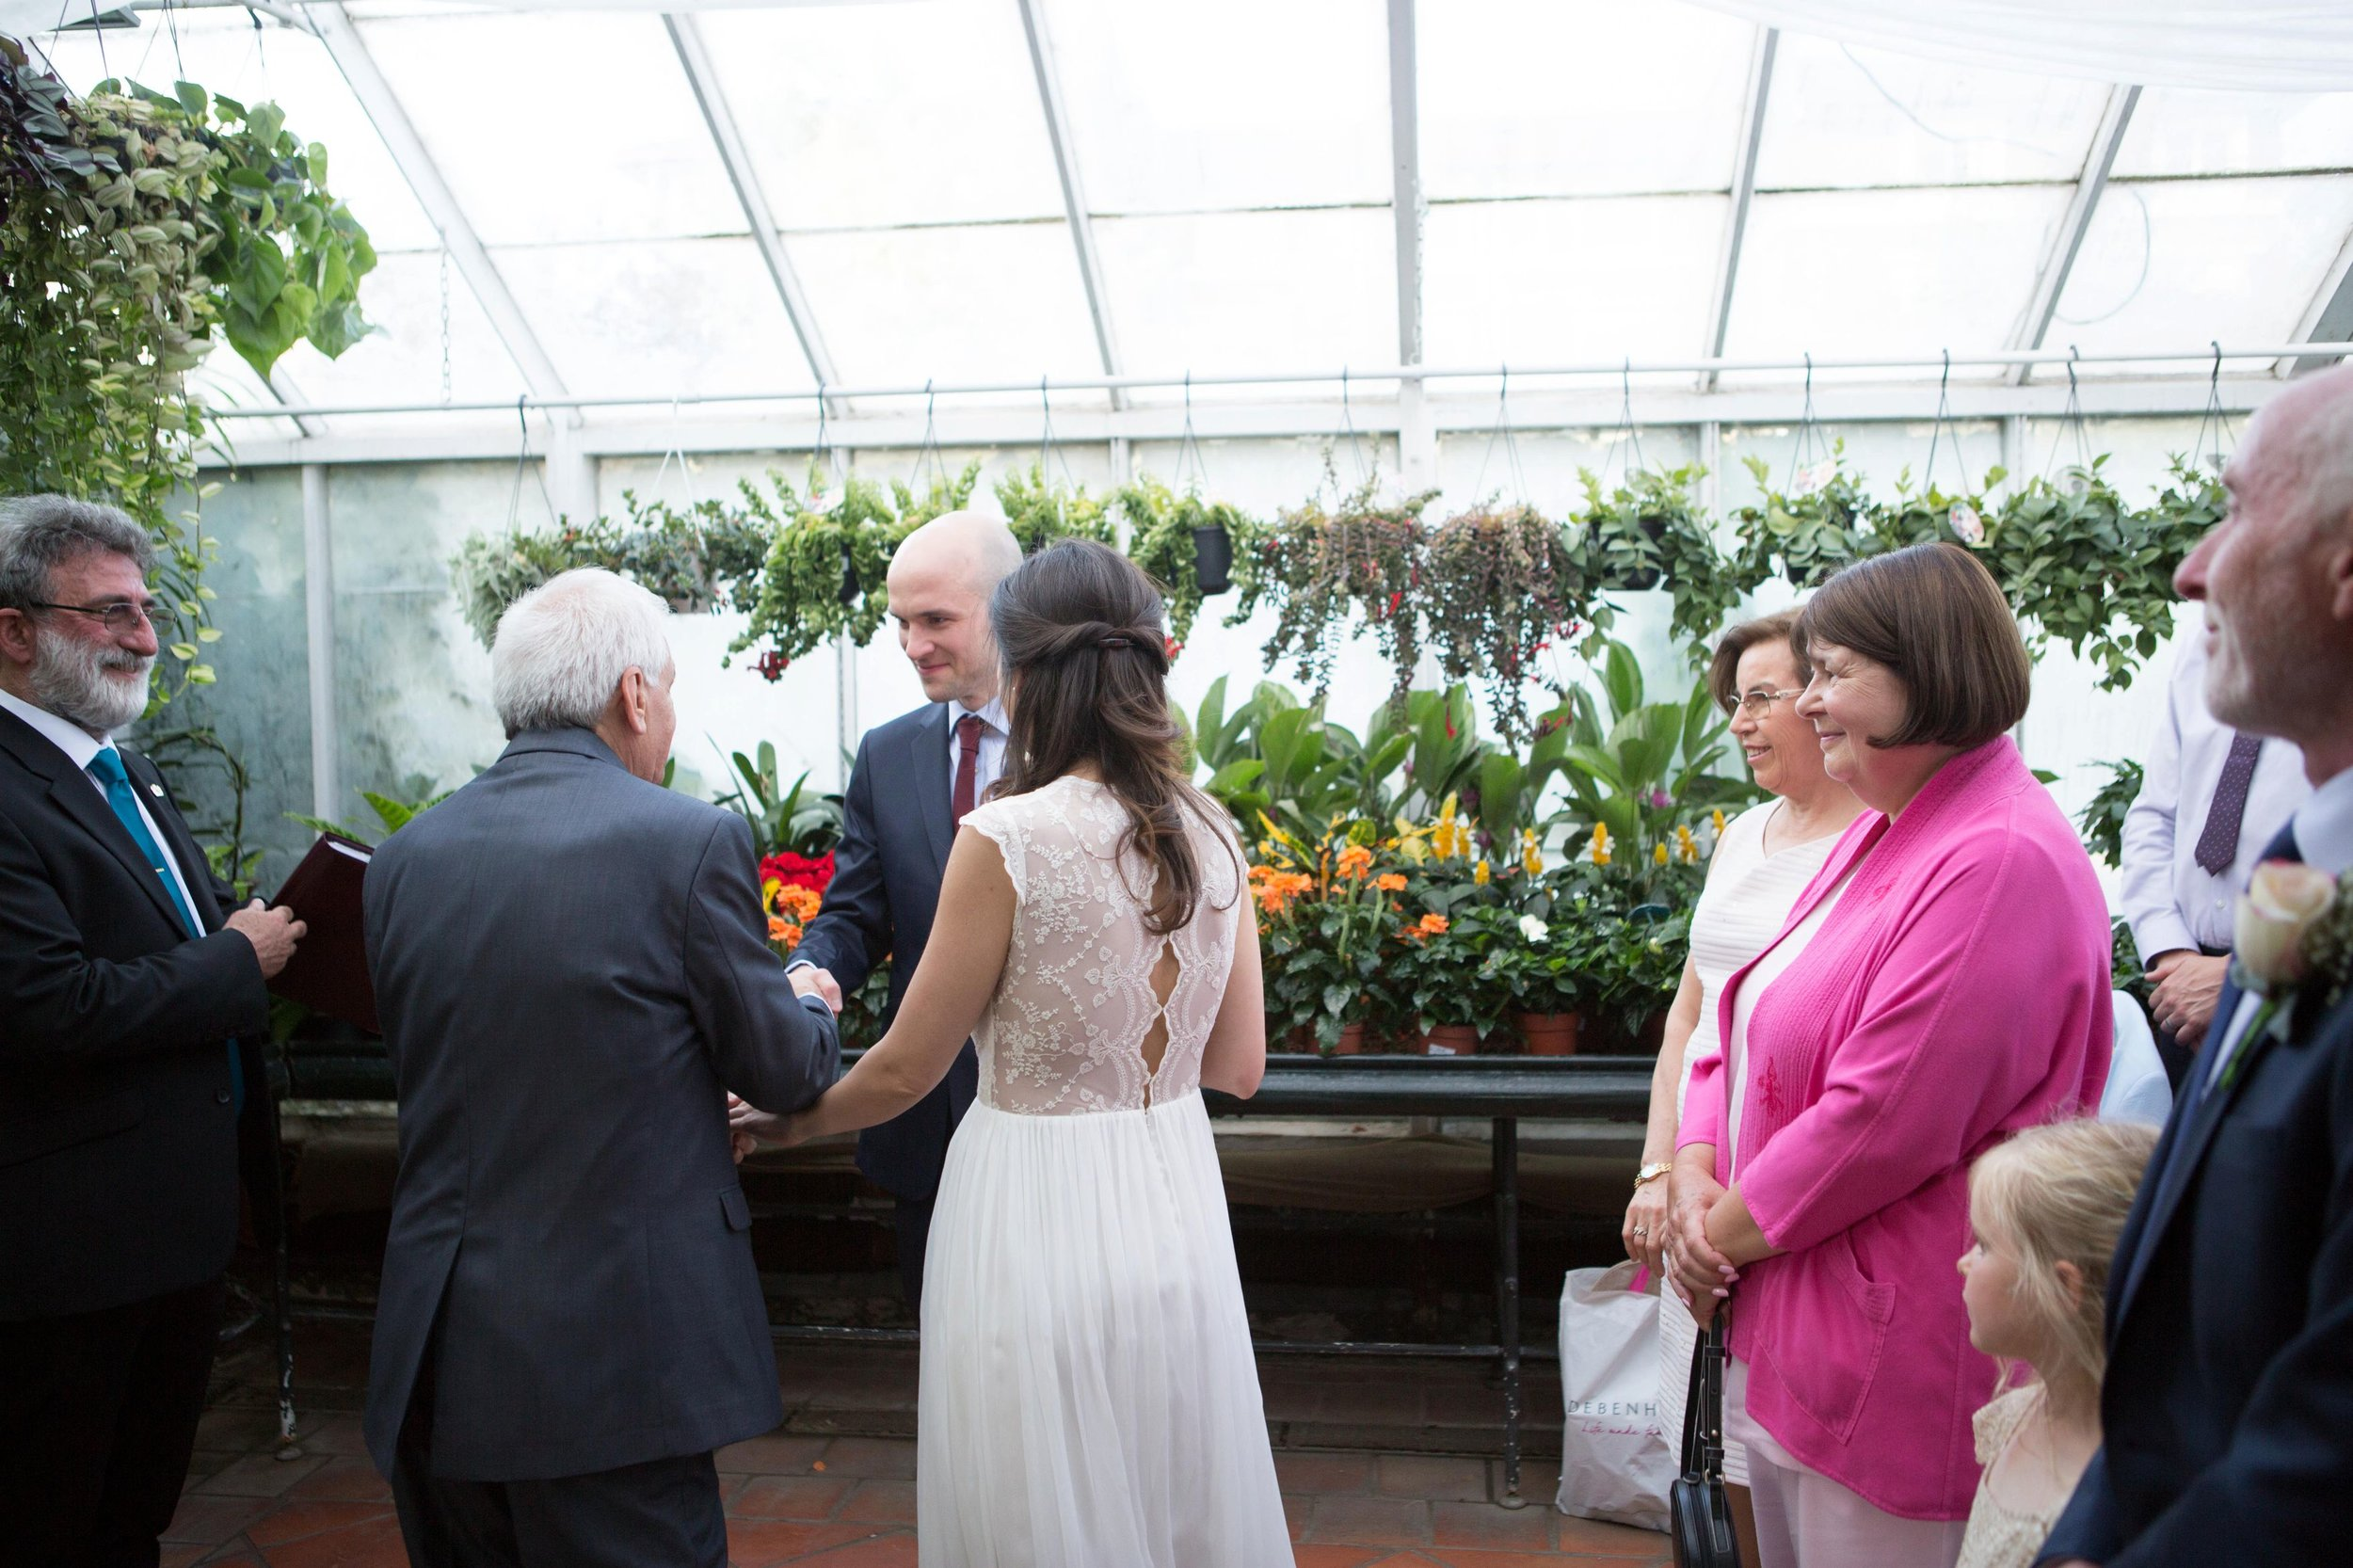 Hulya_&_Ben's_Clifton_Nurseries_London_Wedding_0206.jpg